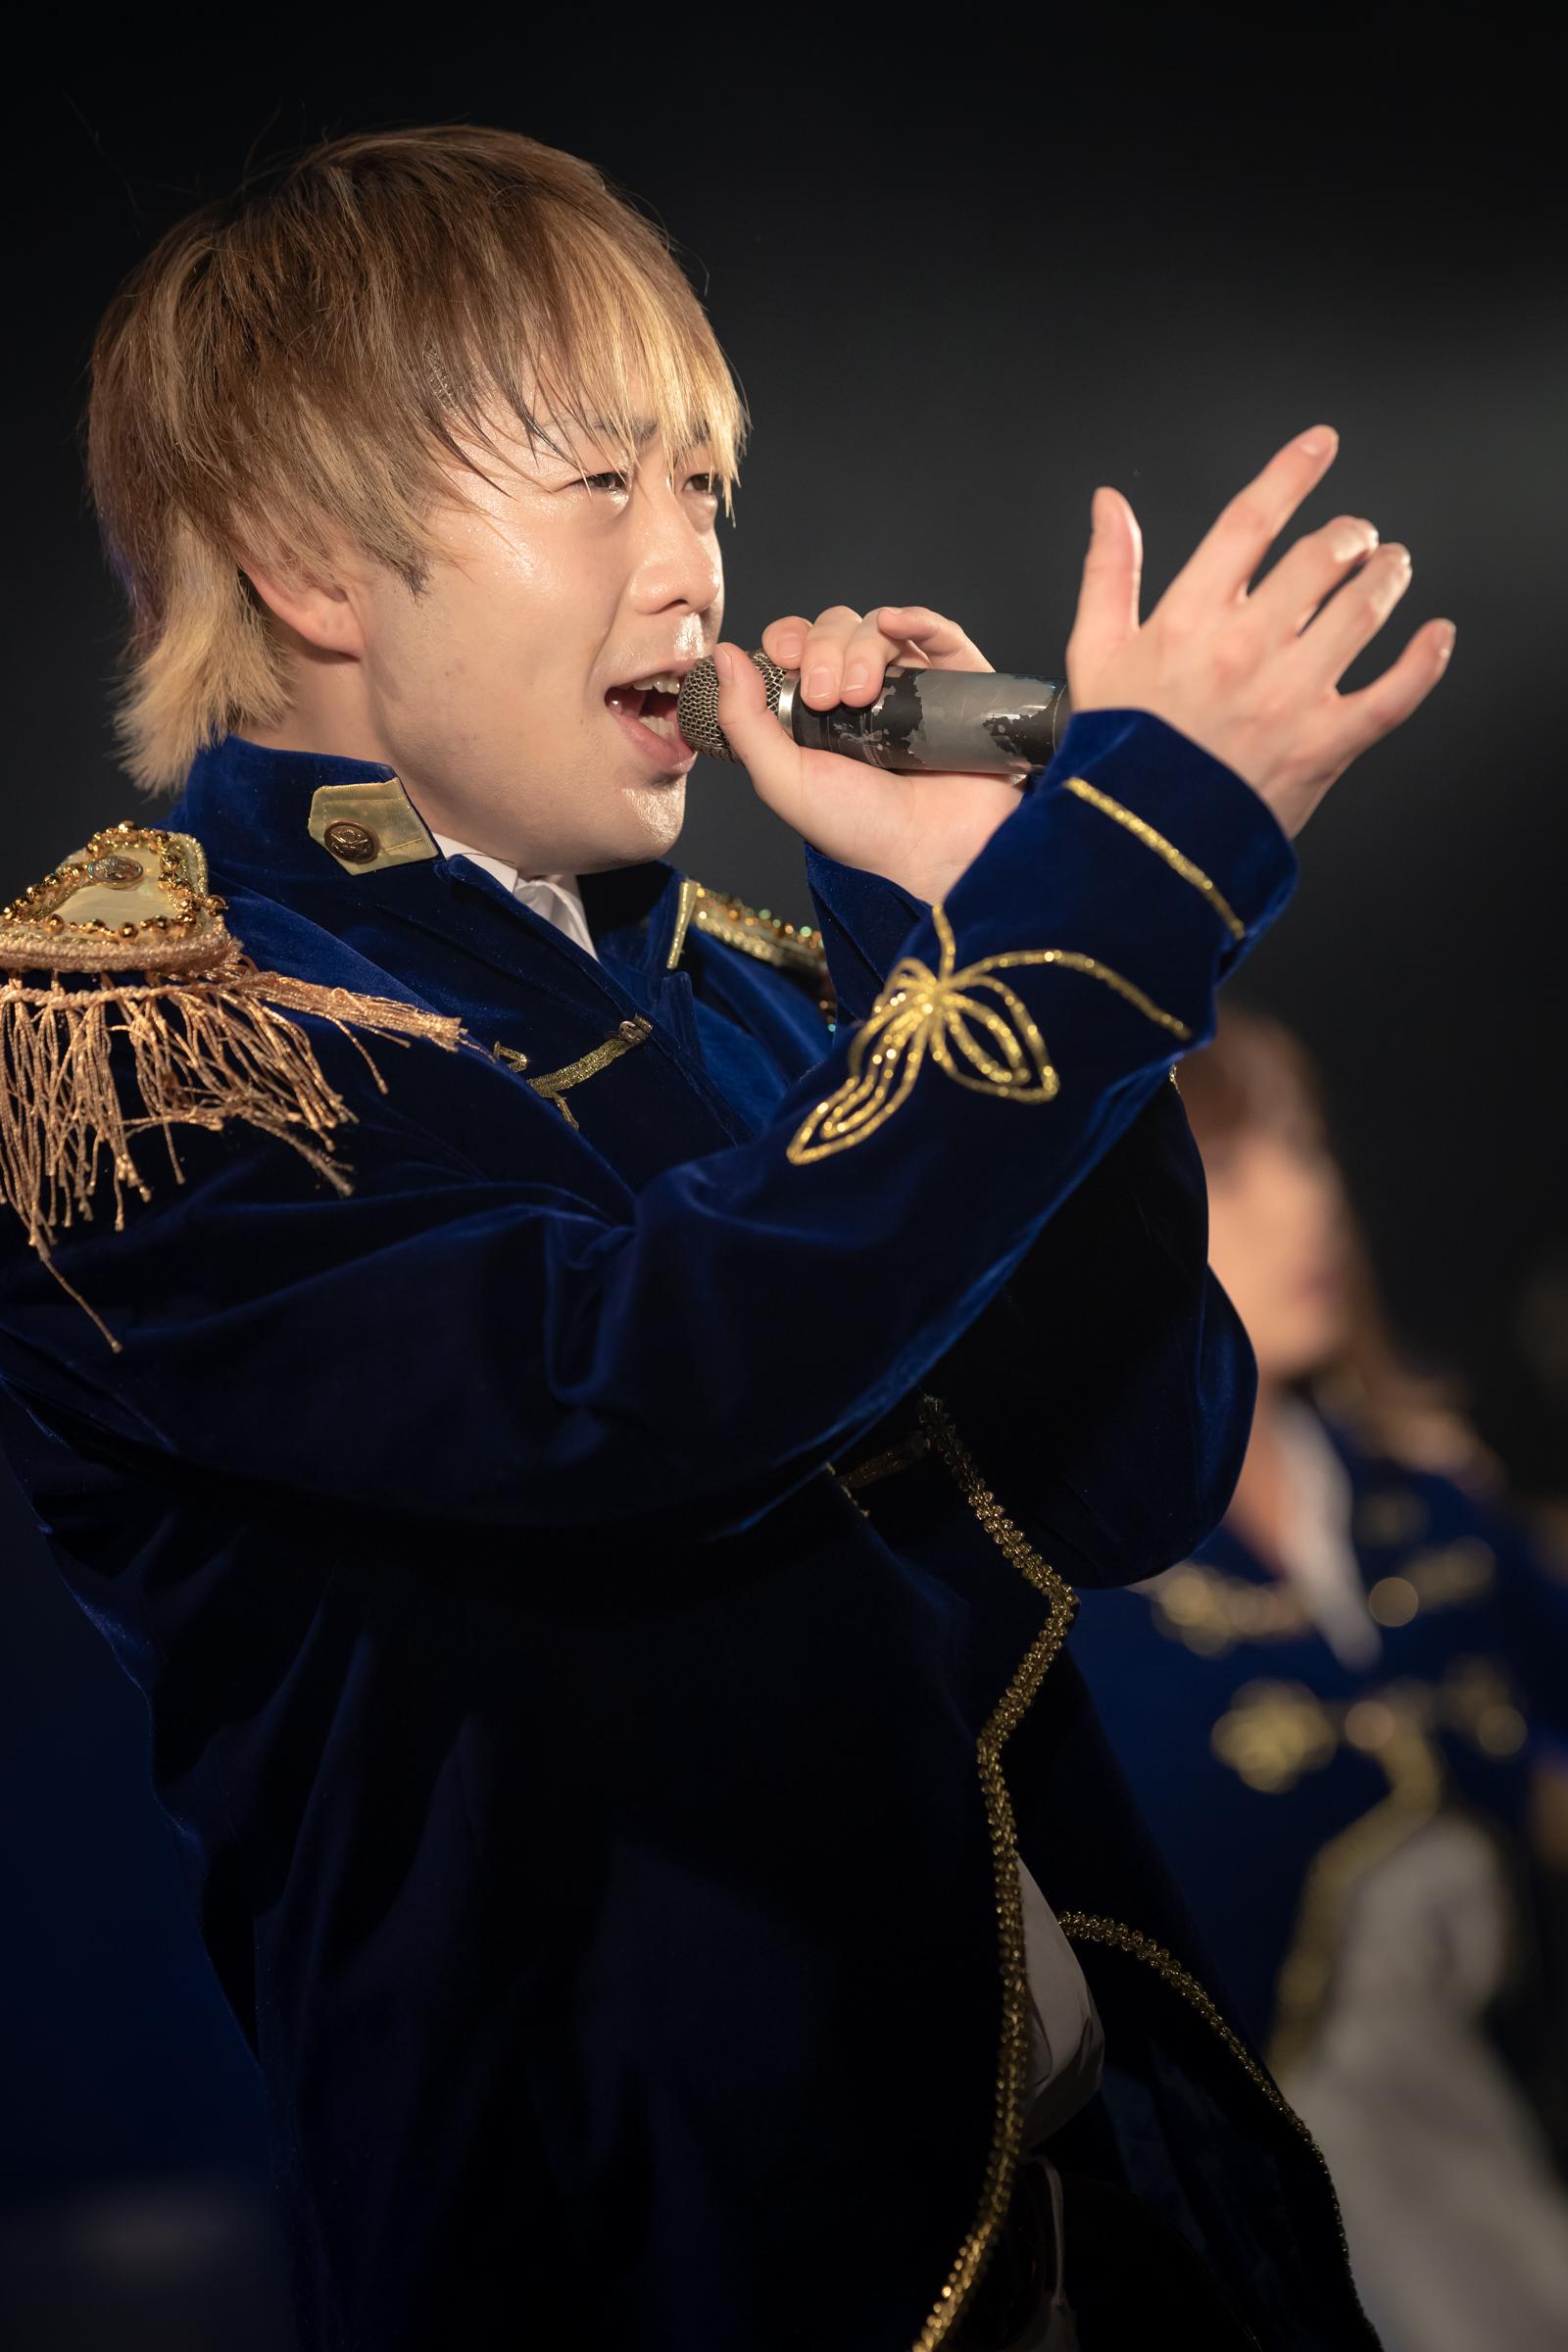 G.E.E.K RYO | フルーティー定期公演フルーツバスケット~おまる生誕~